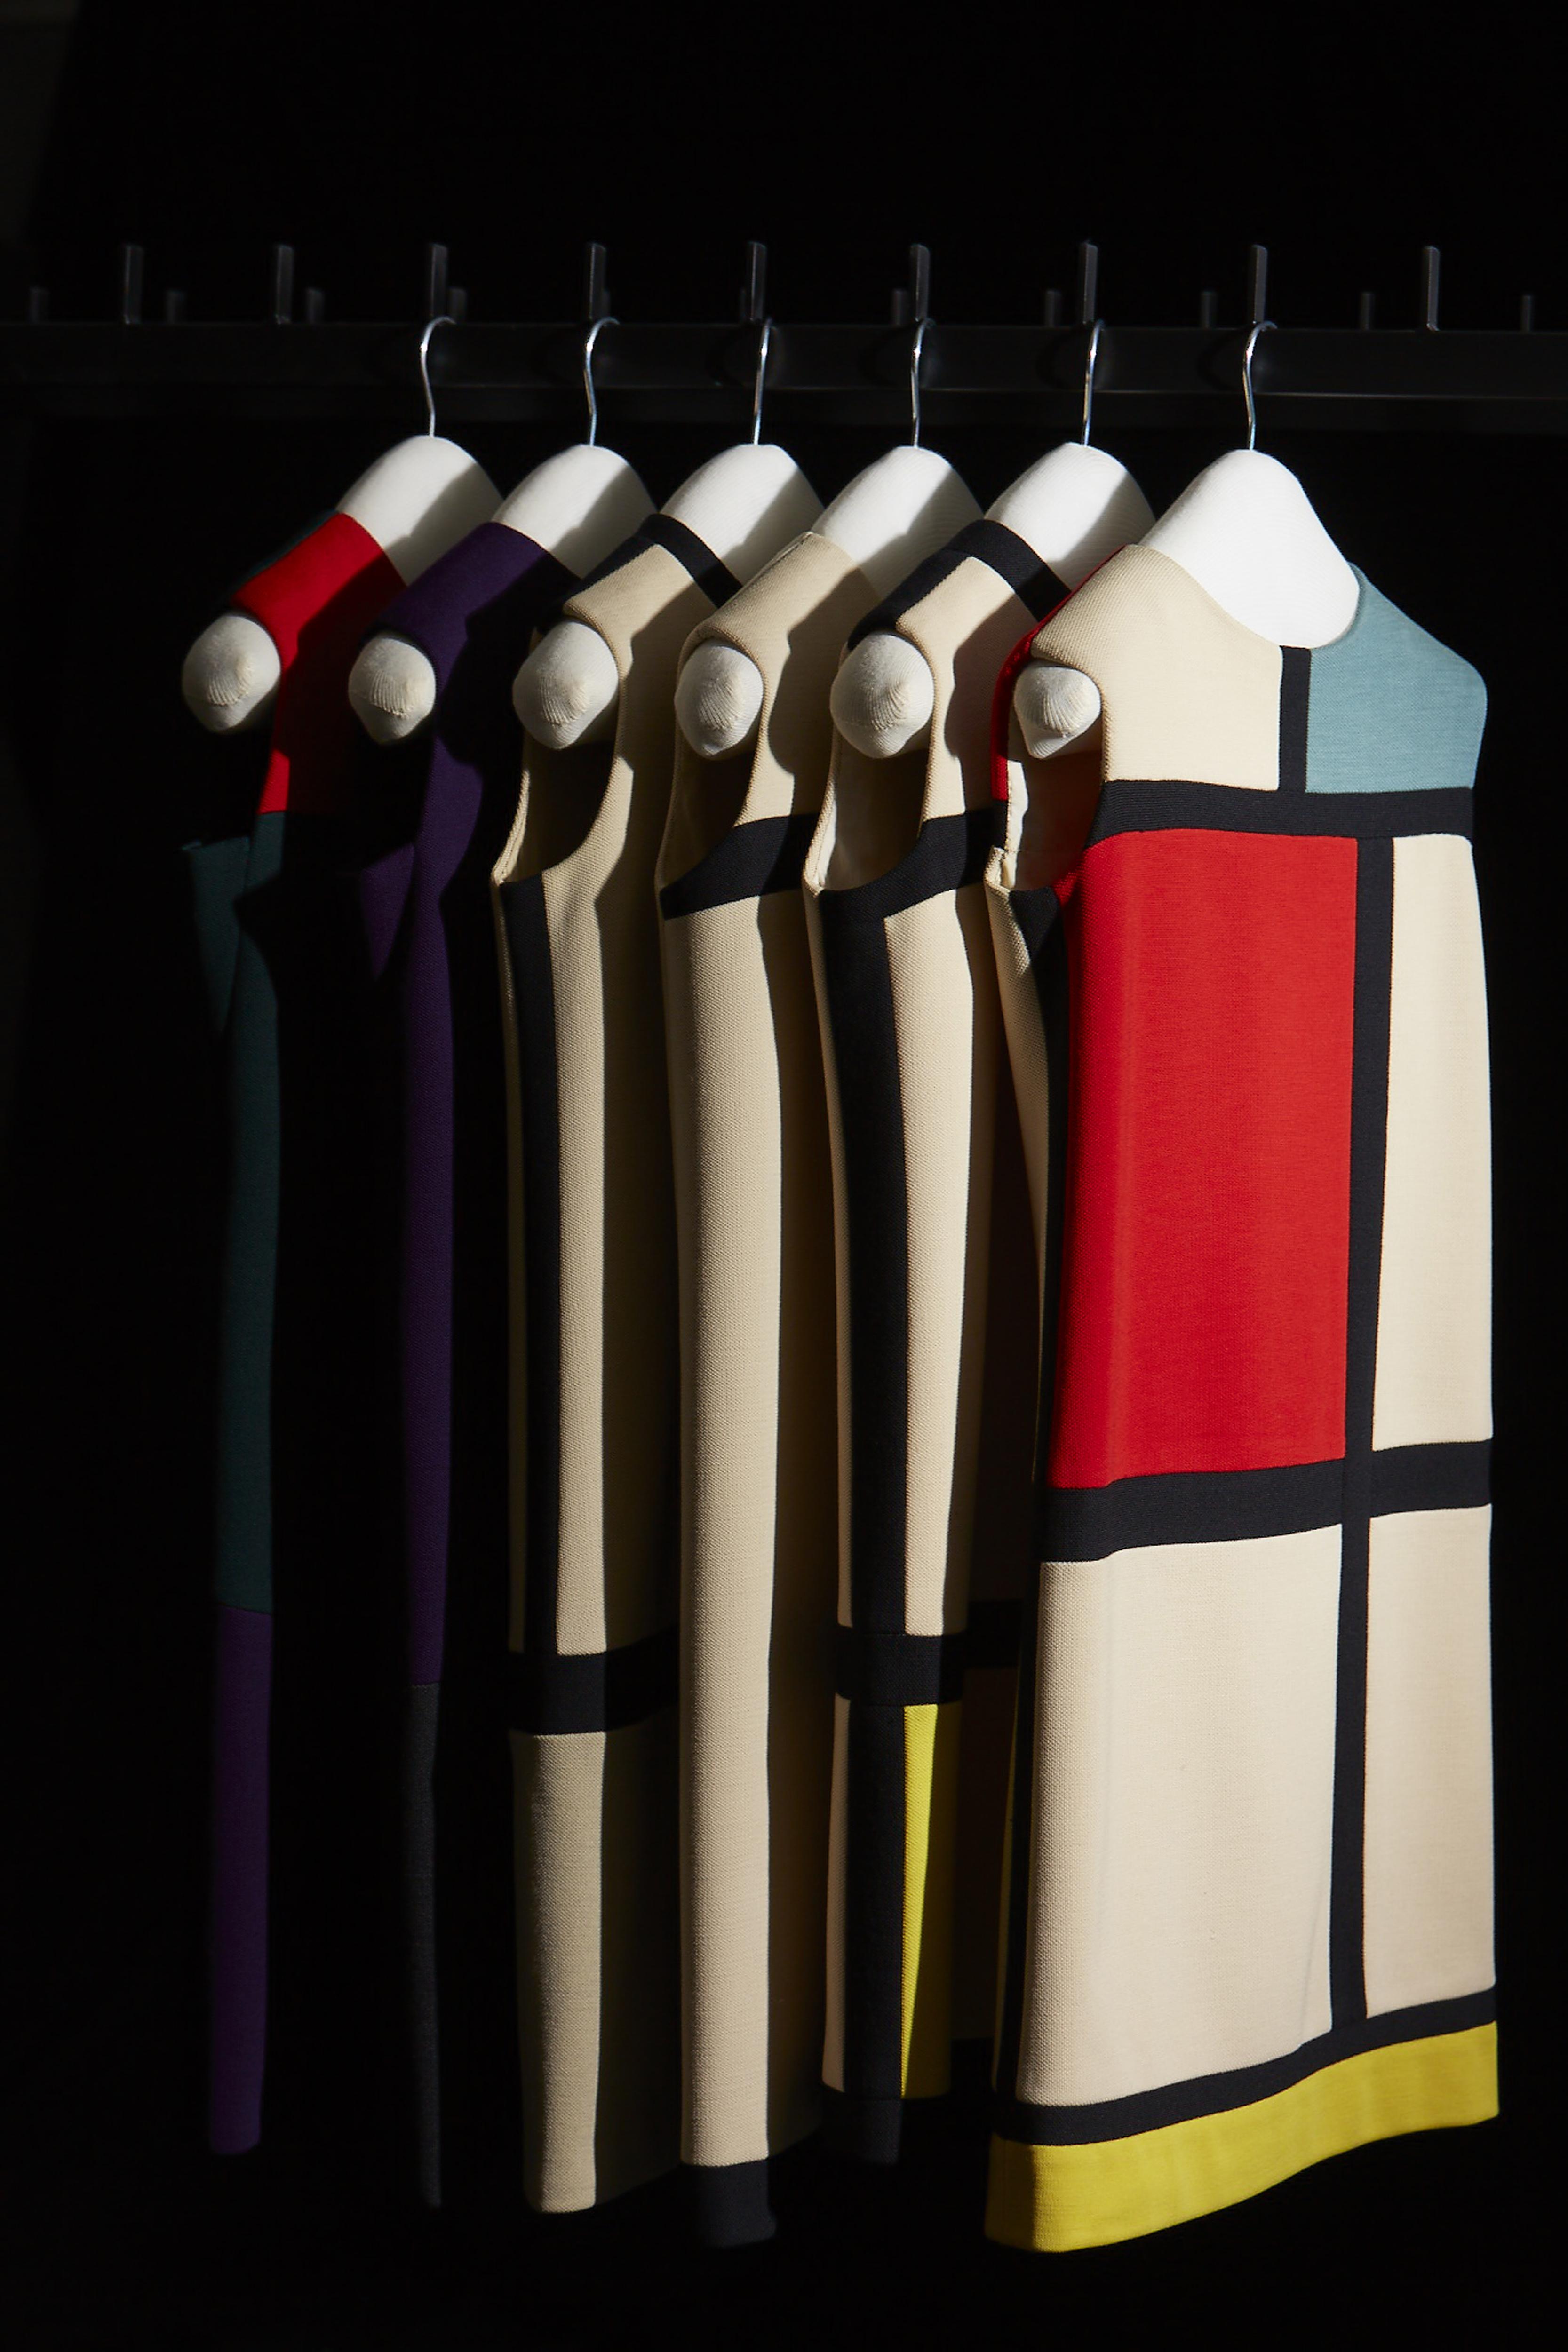 Homage to Piet Mondrian - Yves Saint Laurent